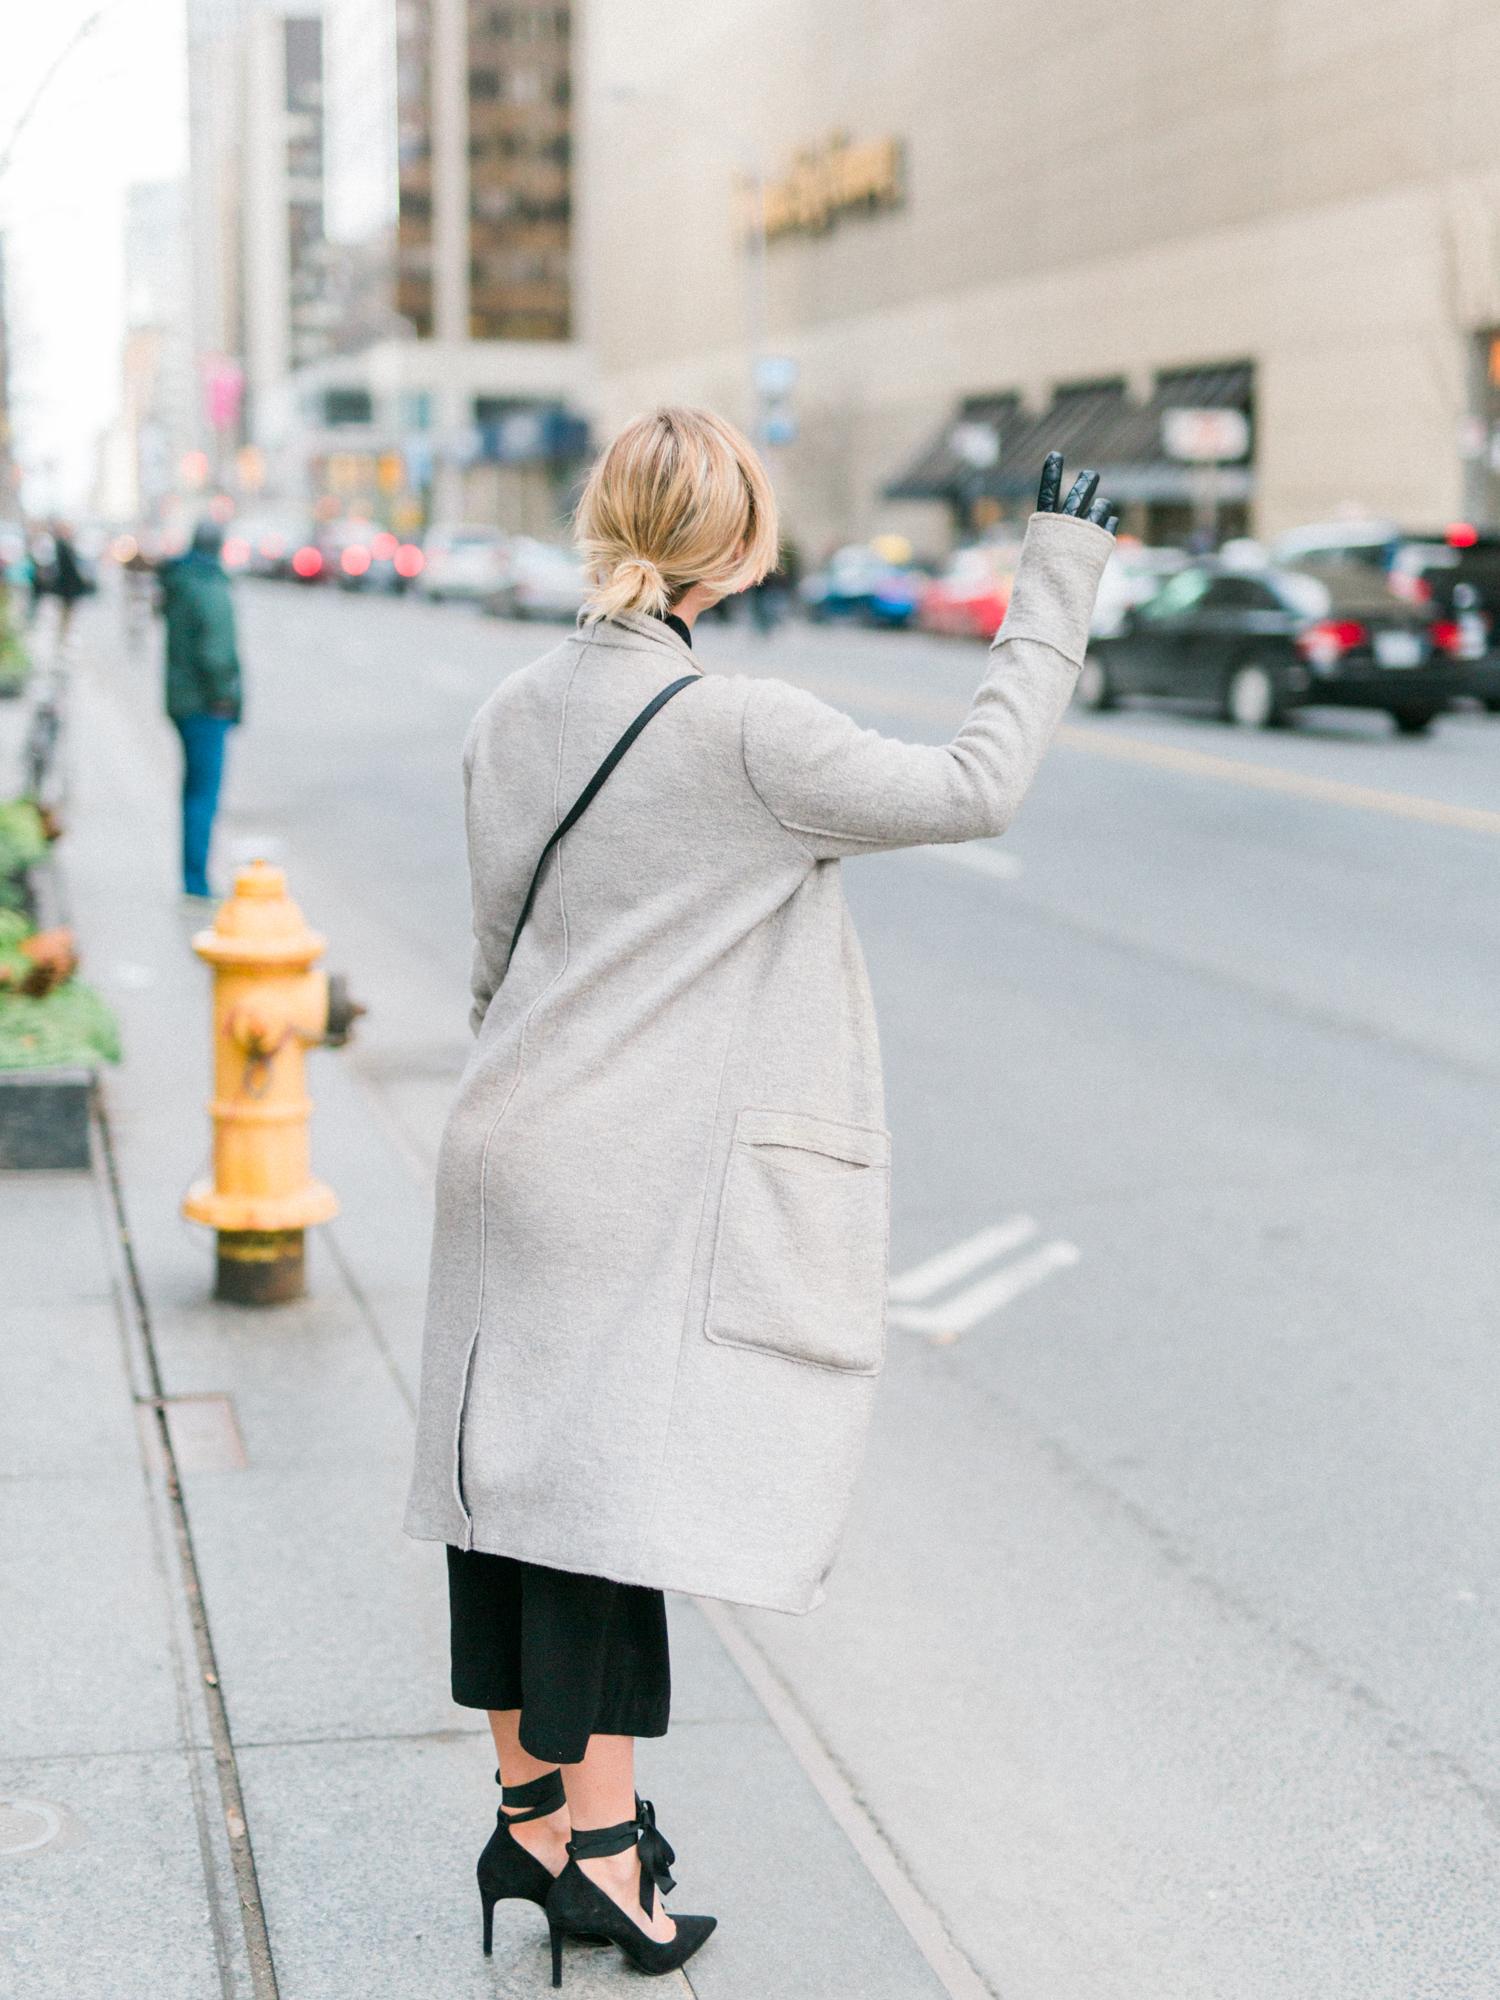 DanielleGirouxPhotography_Toronto_Portrait_StreetPhotography_0C6A1032.jpg